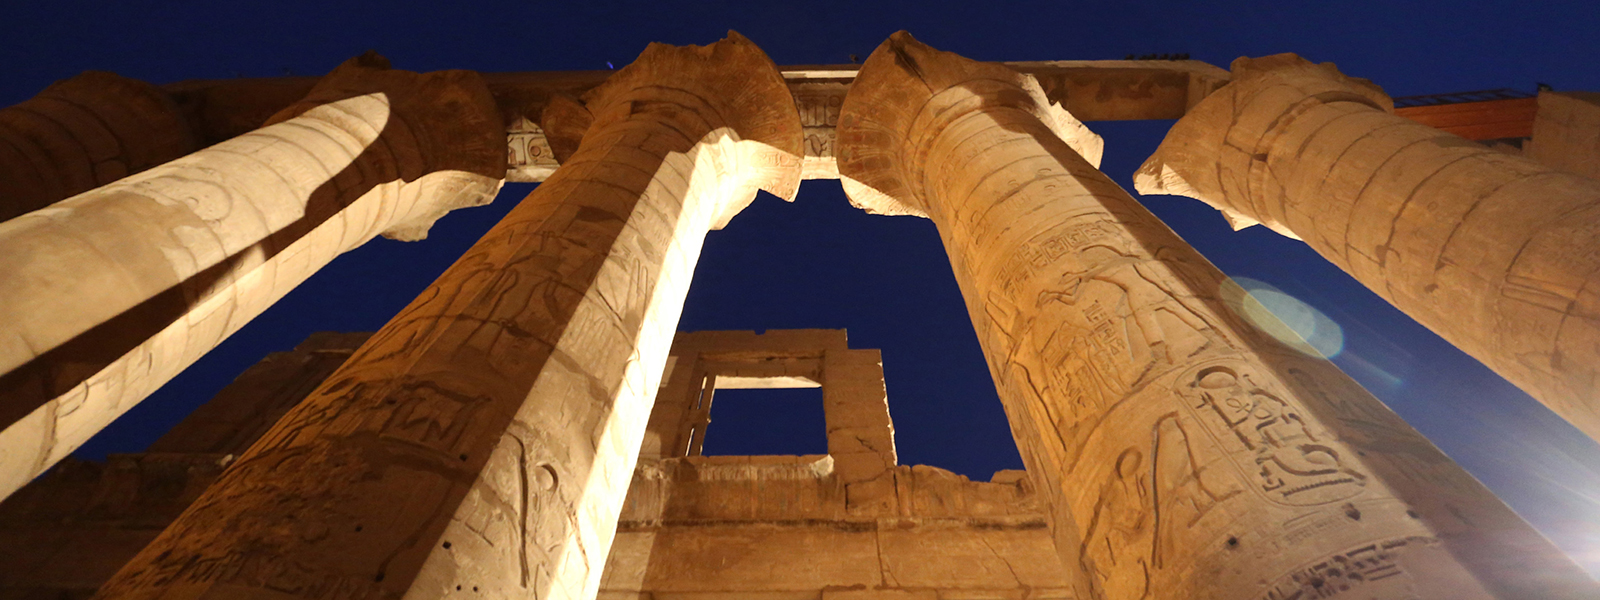 temple_Egypt_18016830844_Dominic-Chavez_1600x600.jpg